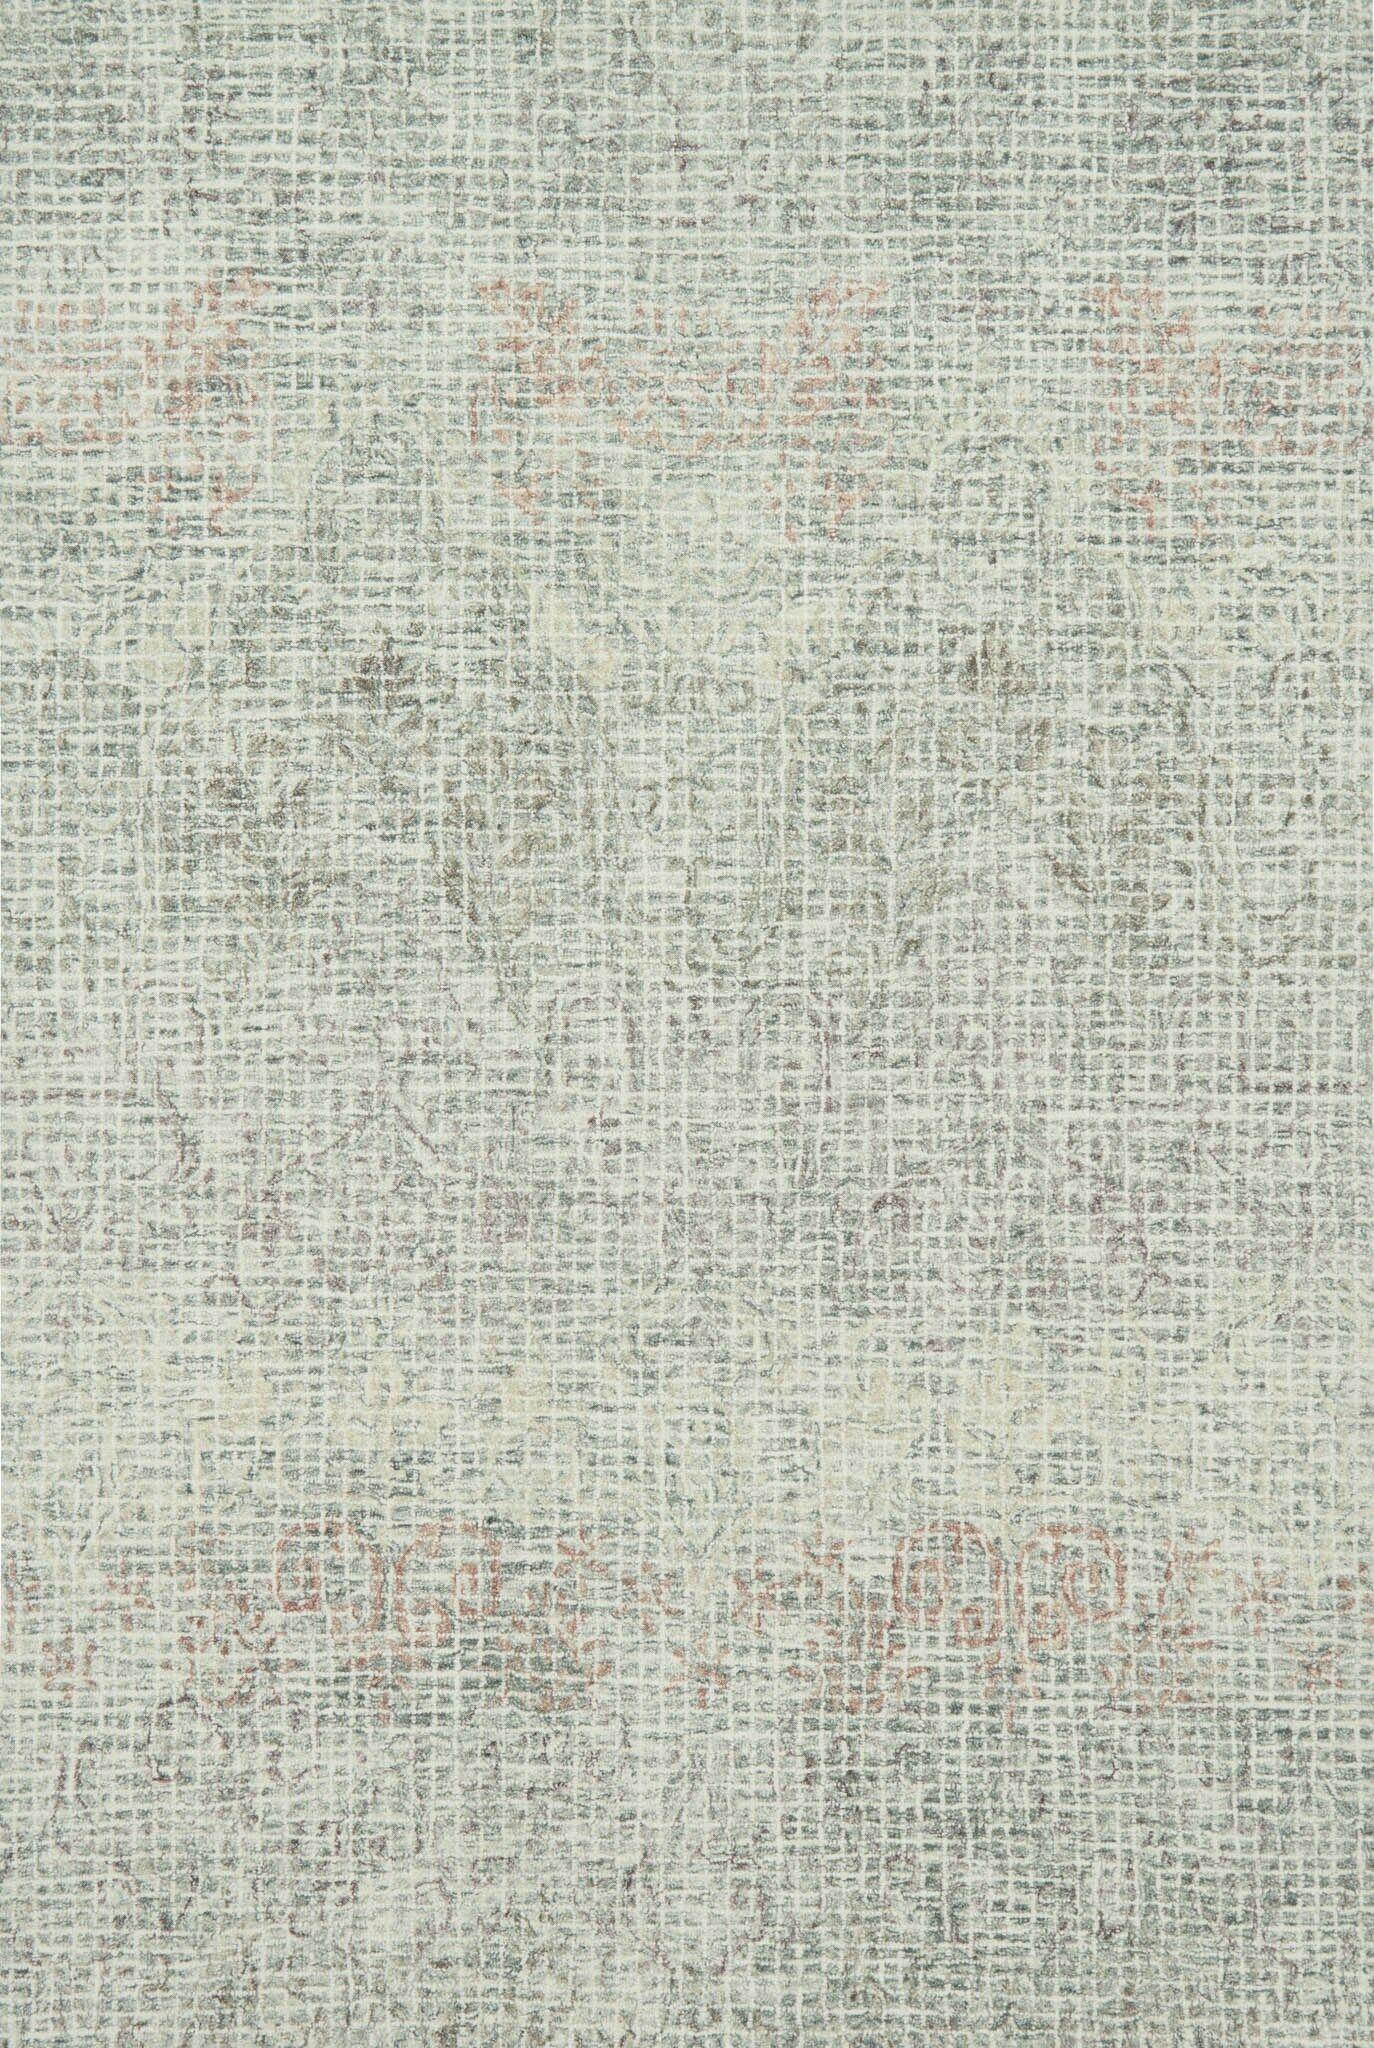 Zeinab Hand Hooked Wool Gray/Blush Area Rug Rug Size: Runner 2'6